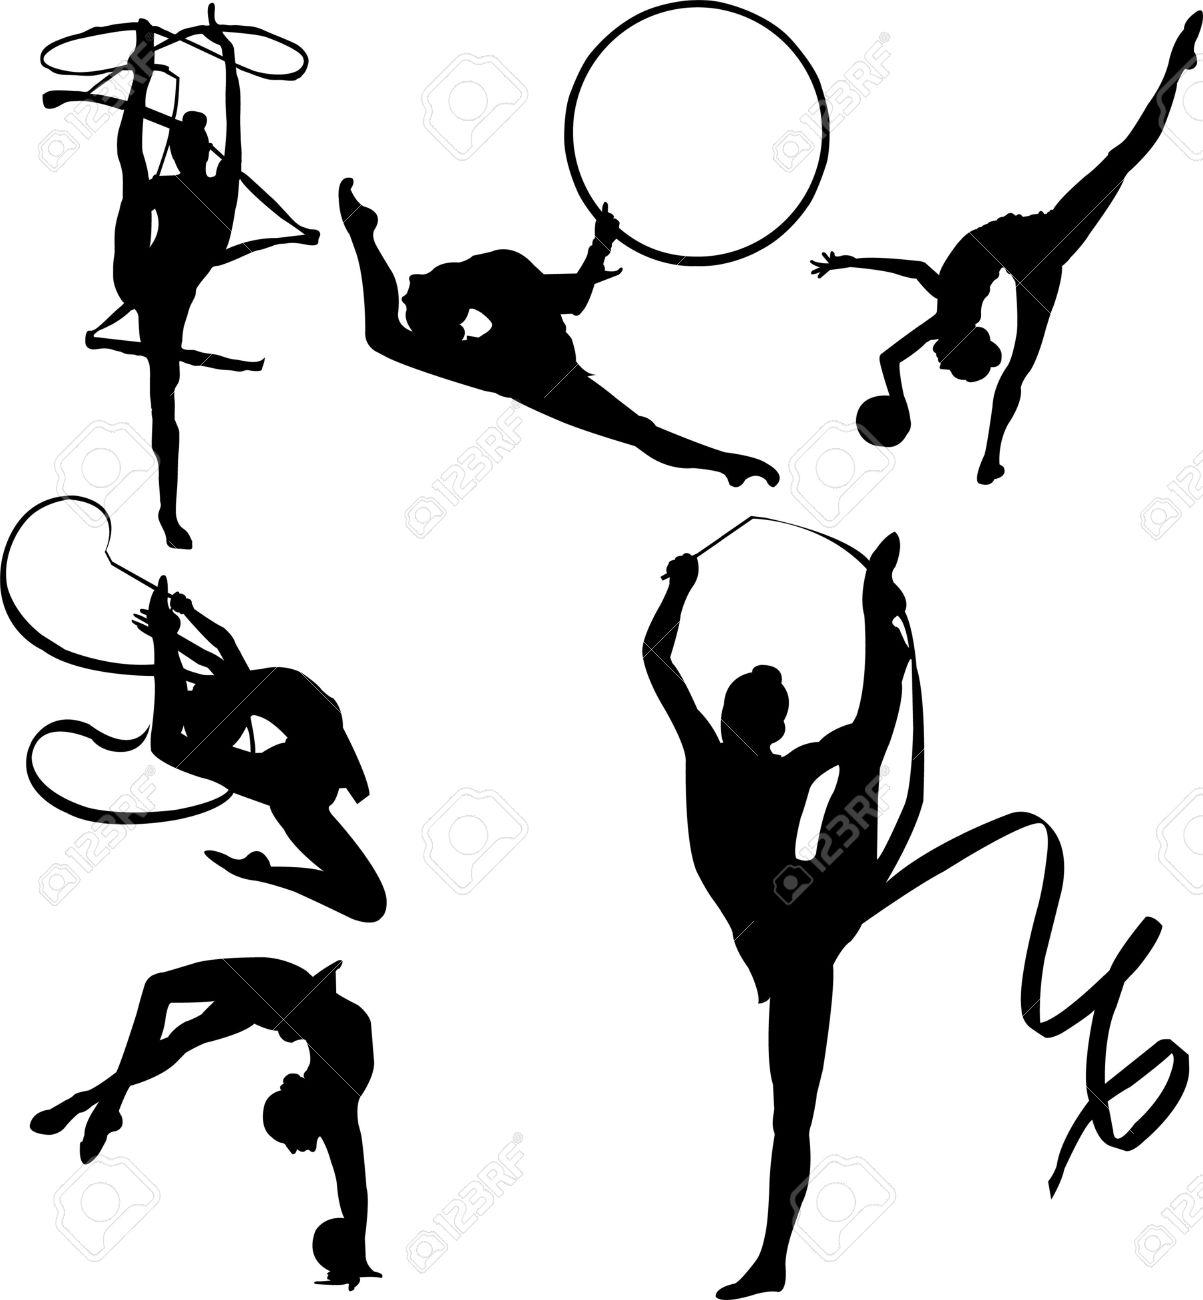 1203x1300 Ball Gymnastics Clipart, Explore Pictures